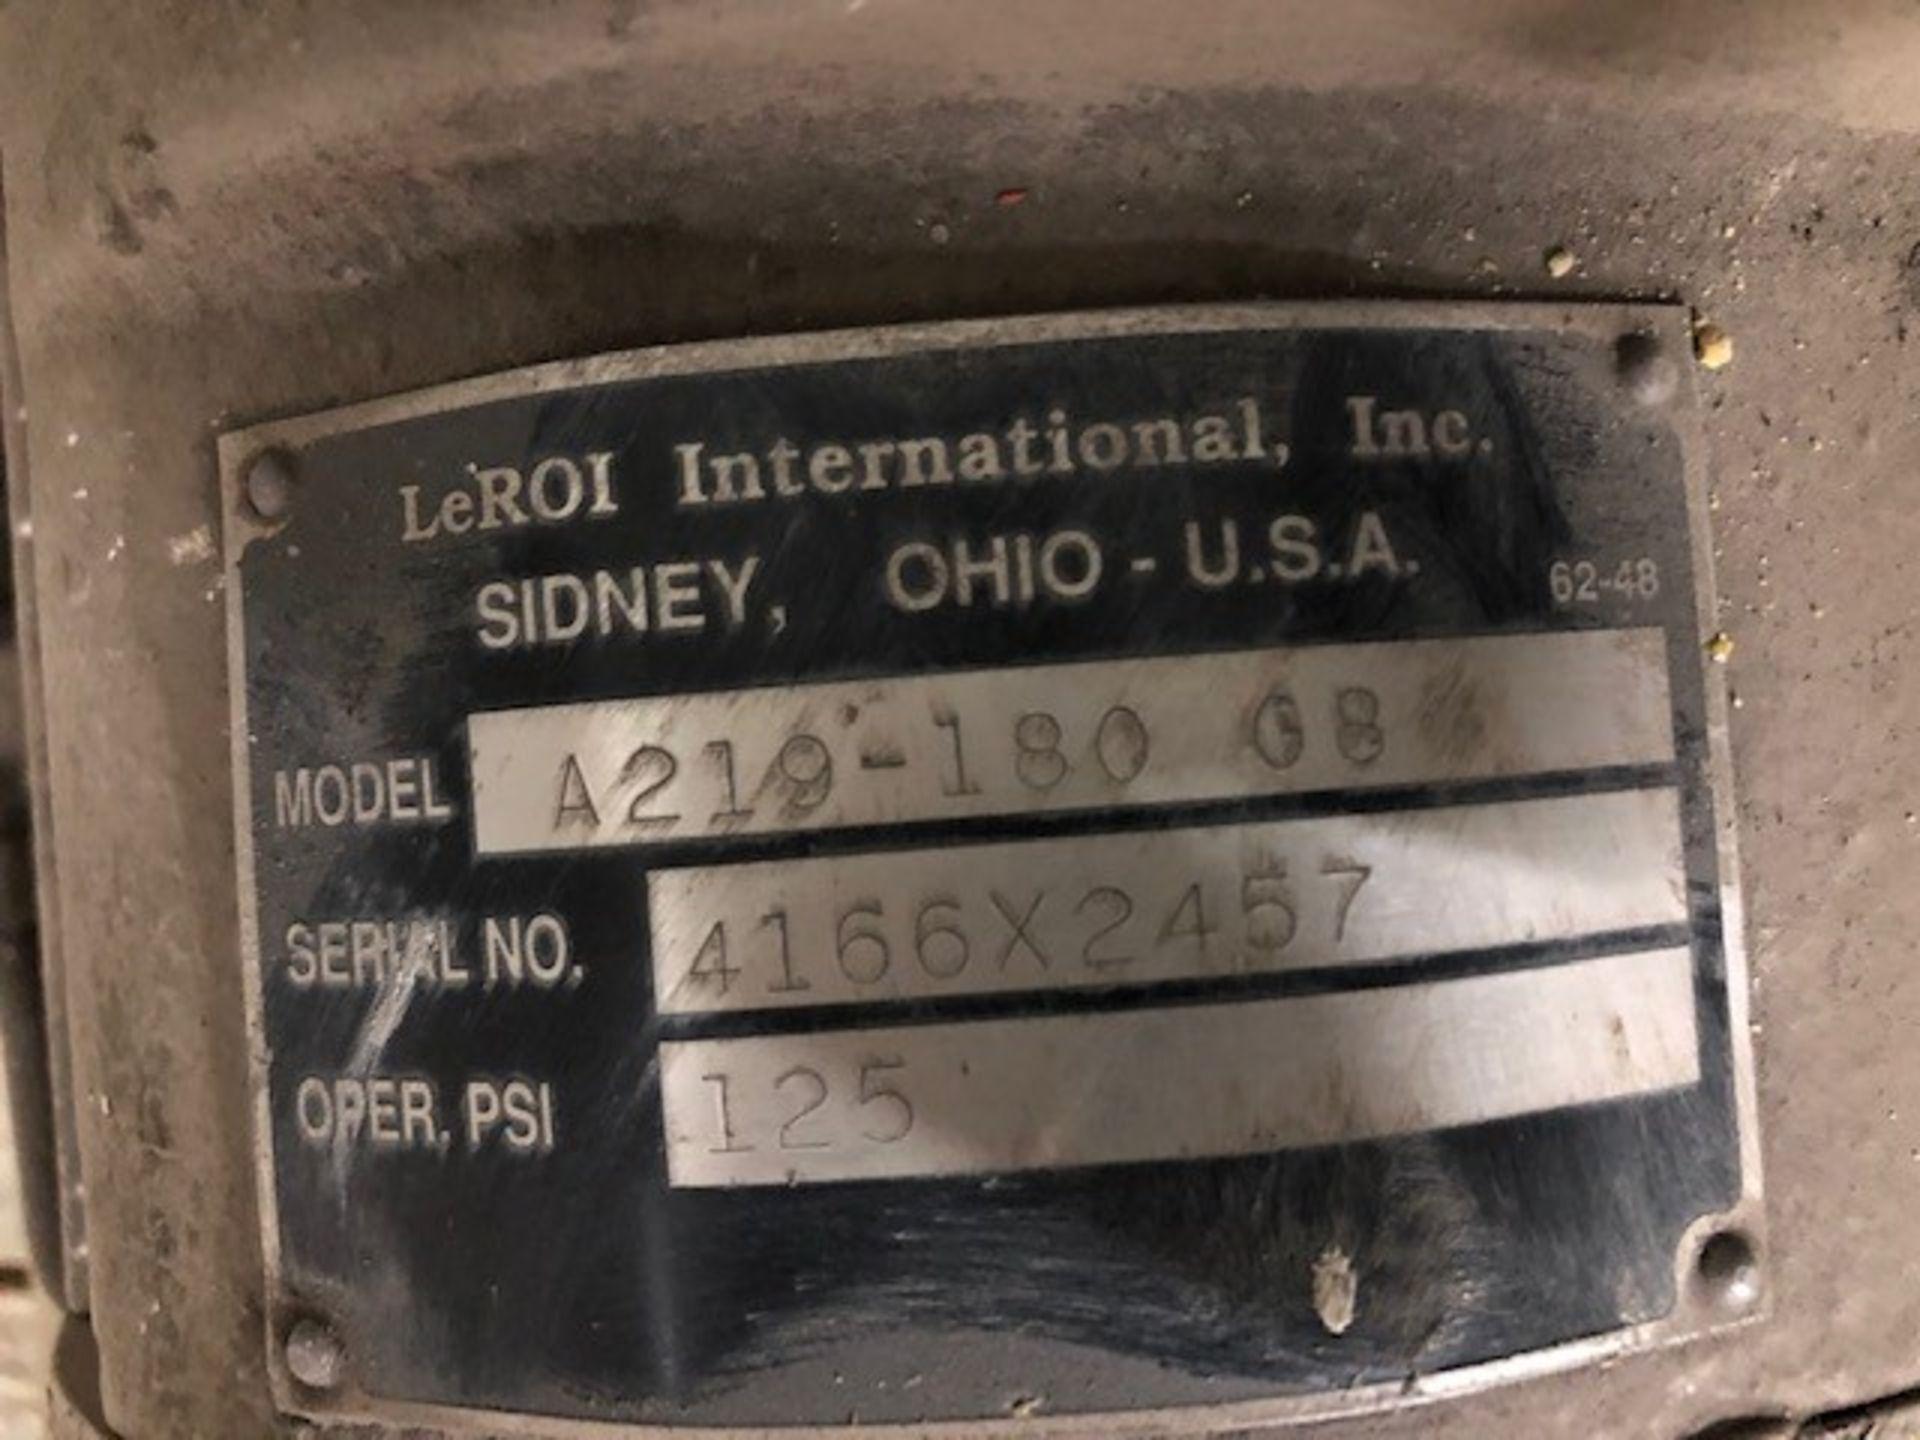 Air Compressor 50hp #2 LeRoi International model: A219-180 G8, s/n: 4166X2457, 125psi, 50hp 600v - Image 3 of 3